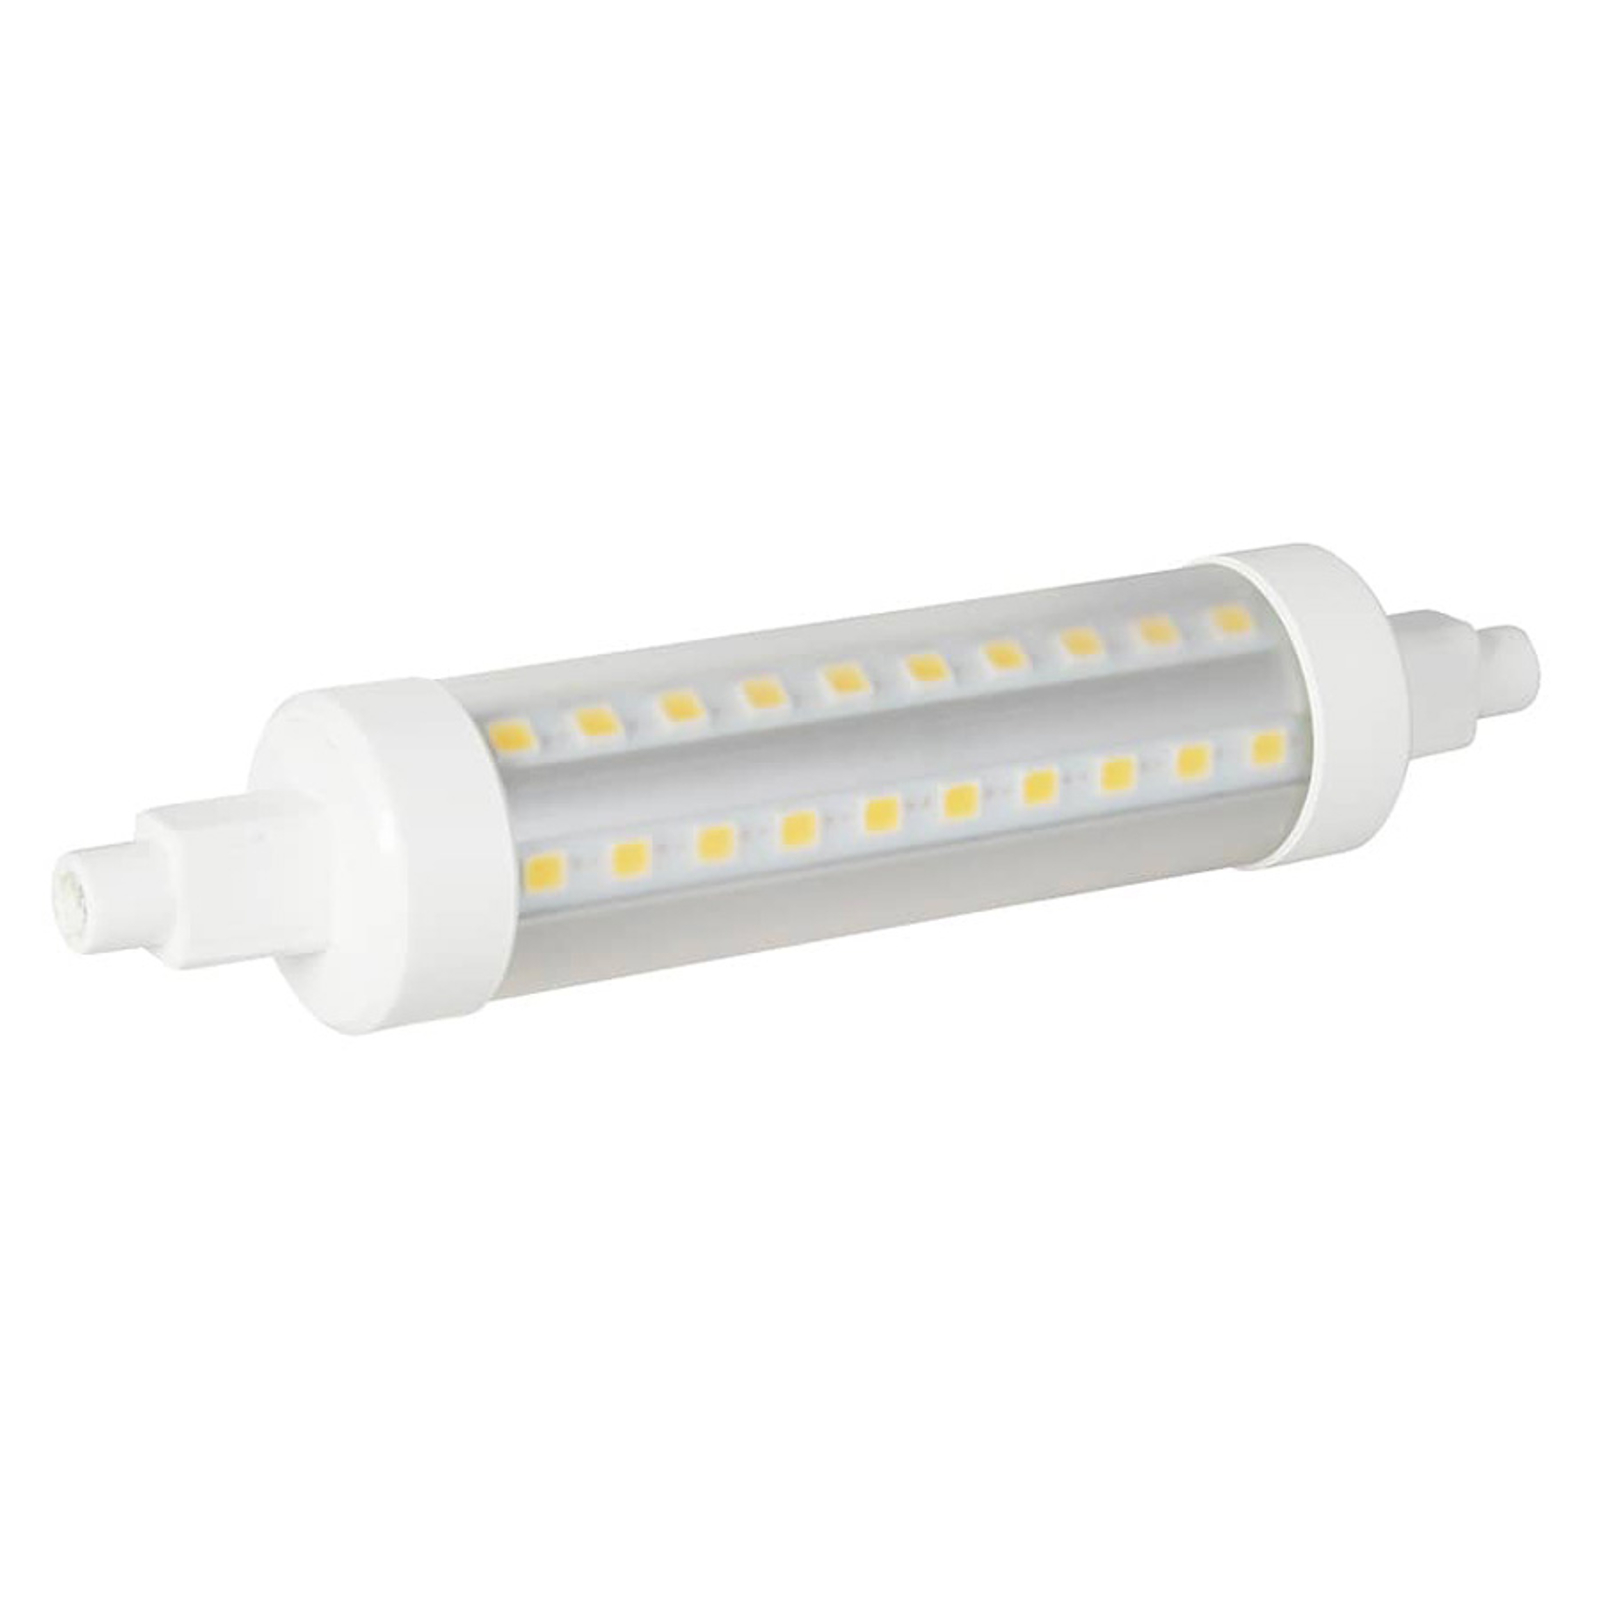 Ampoule LED VEO R7S 118mm 14W blanc chaud 2700K